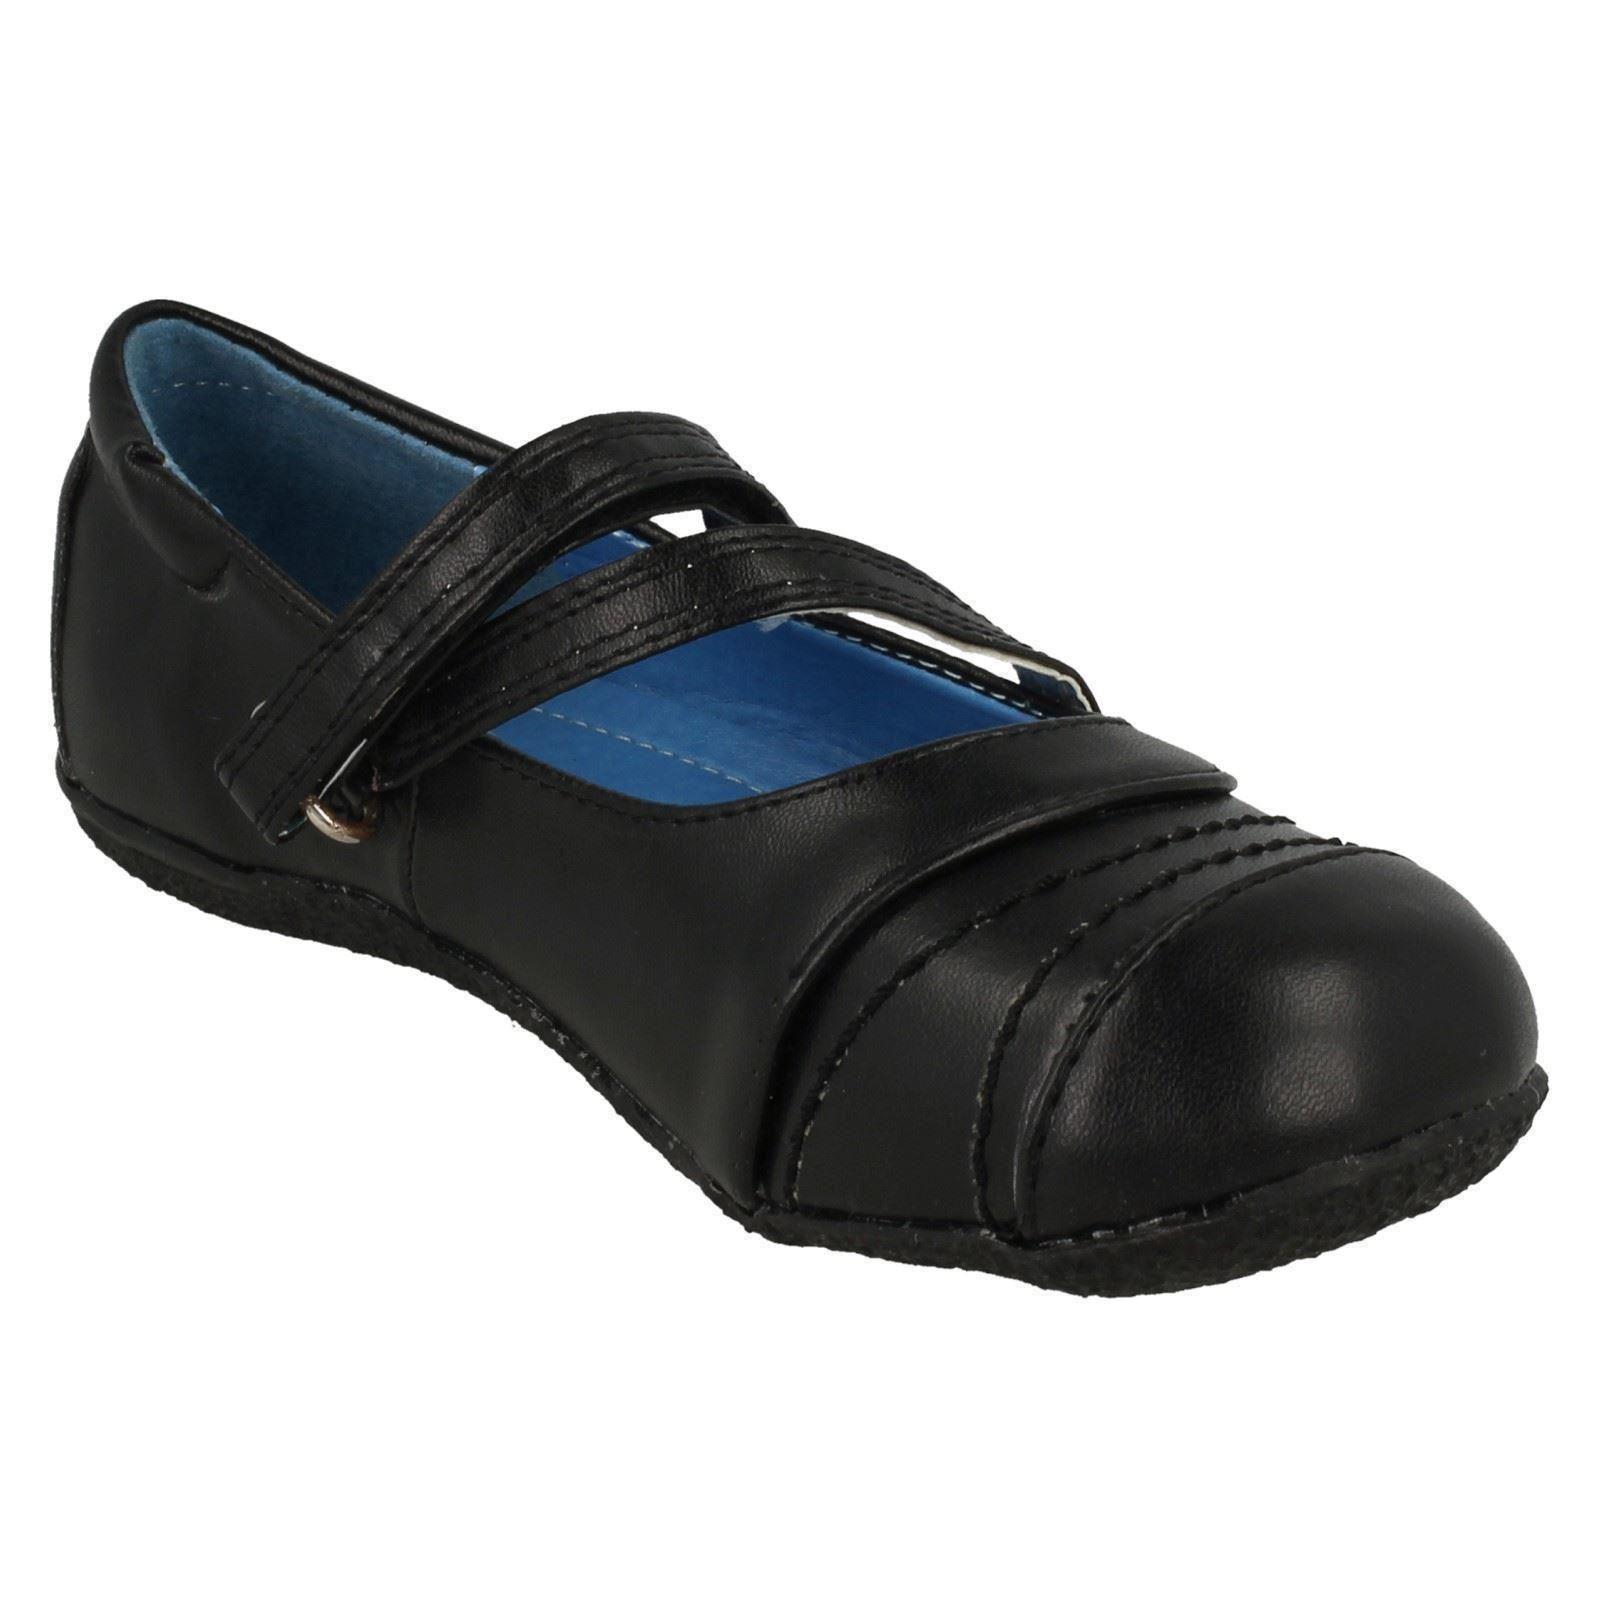 Niñas Spot on H2119 Inteligente Escuela Zapatos Estilo ~ K